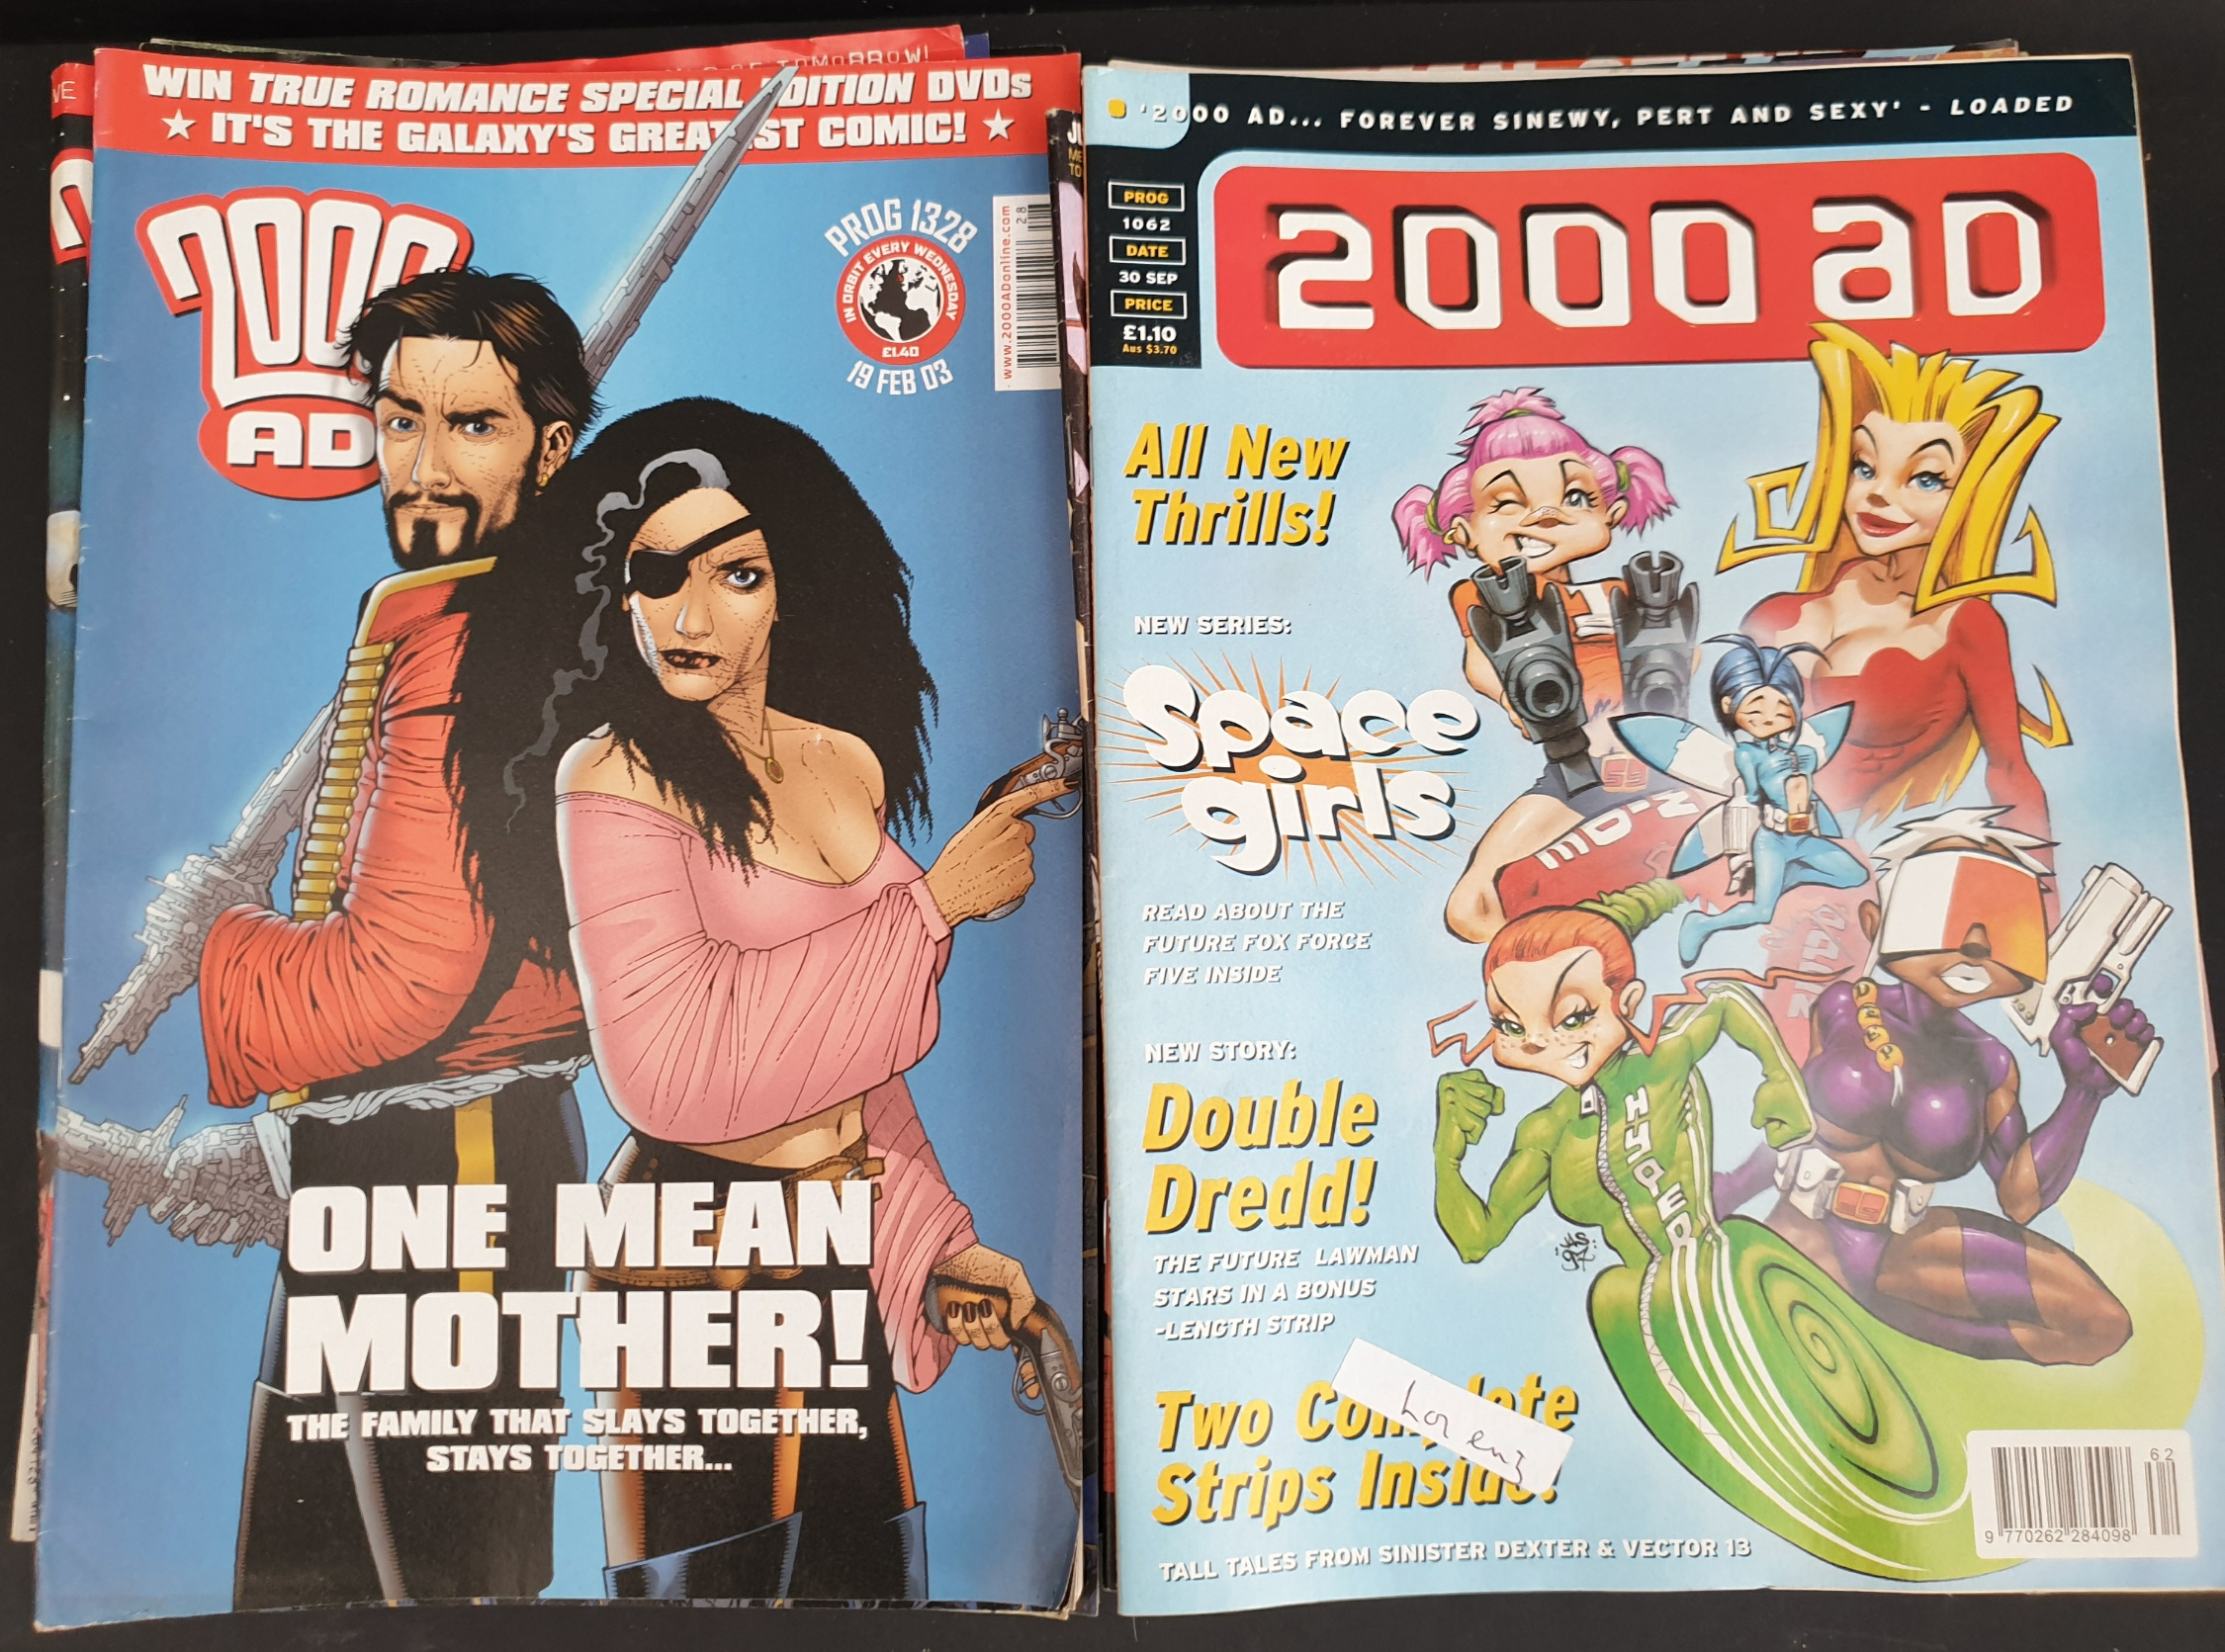 Vintage Parcel of 25 Collectable Comics 2000 AD Judge Dredd - Image 2 of 2